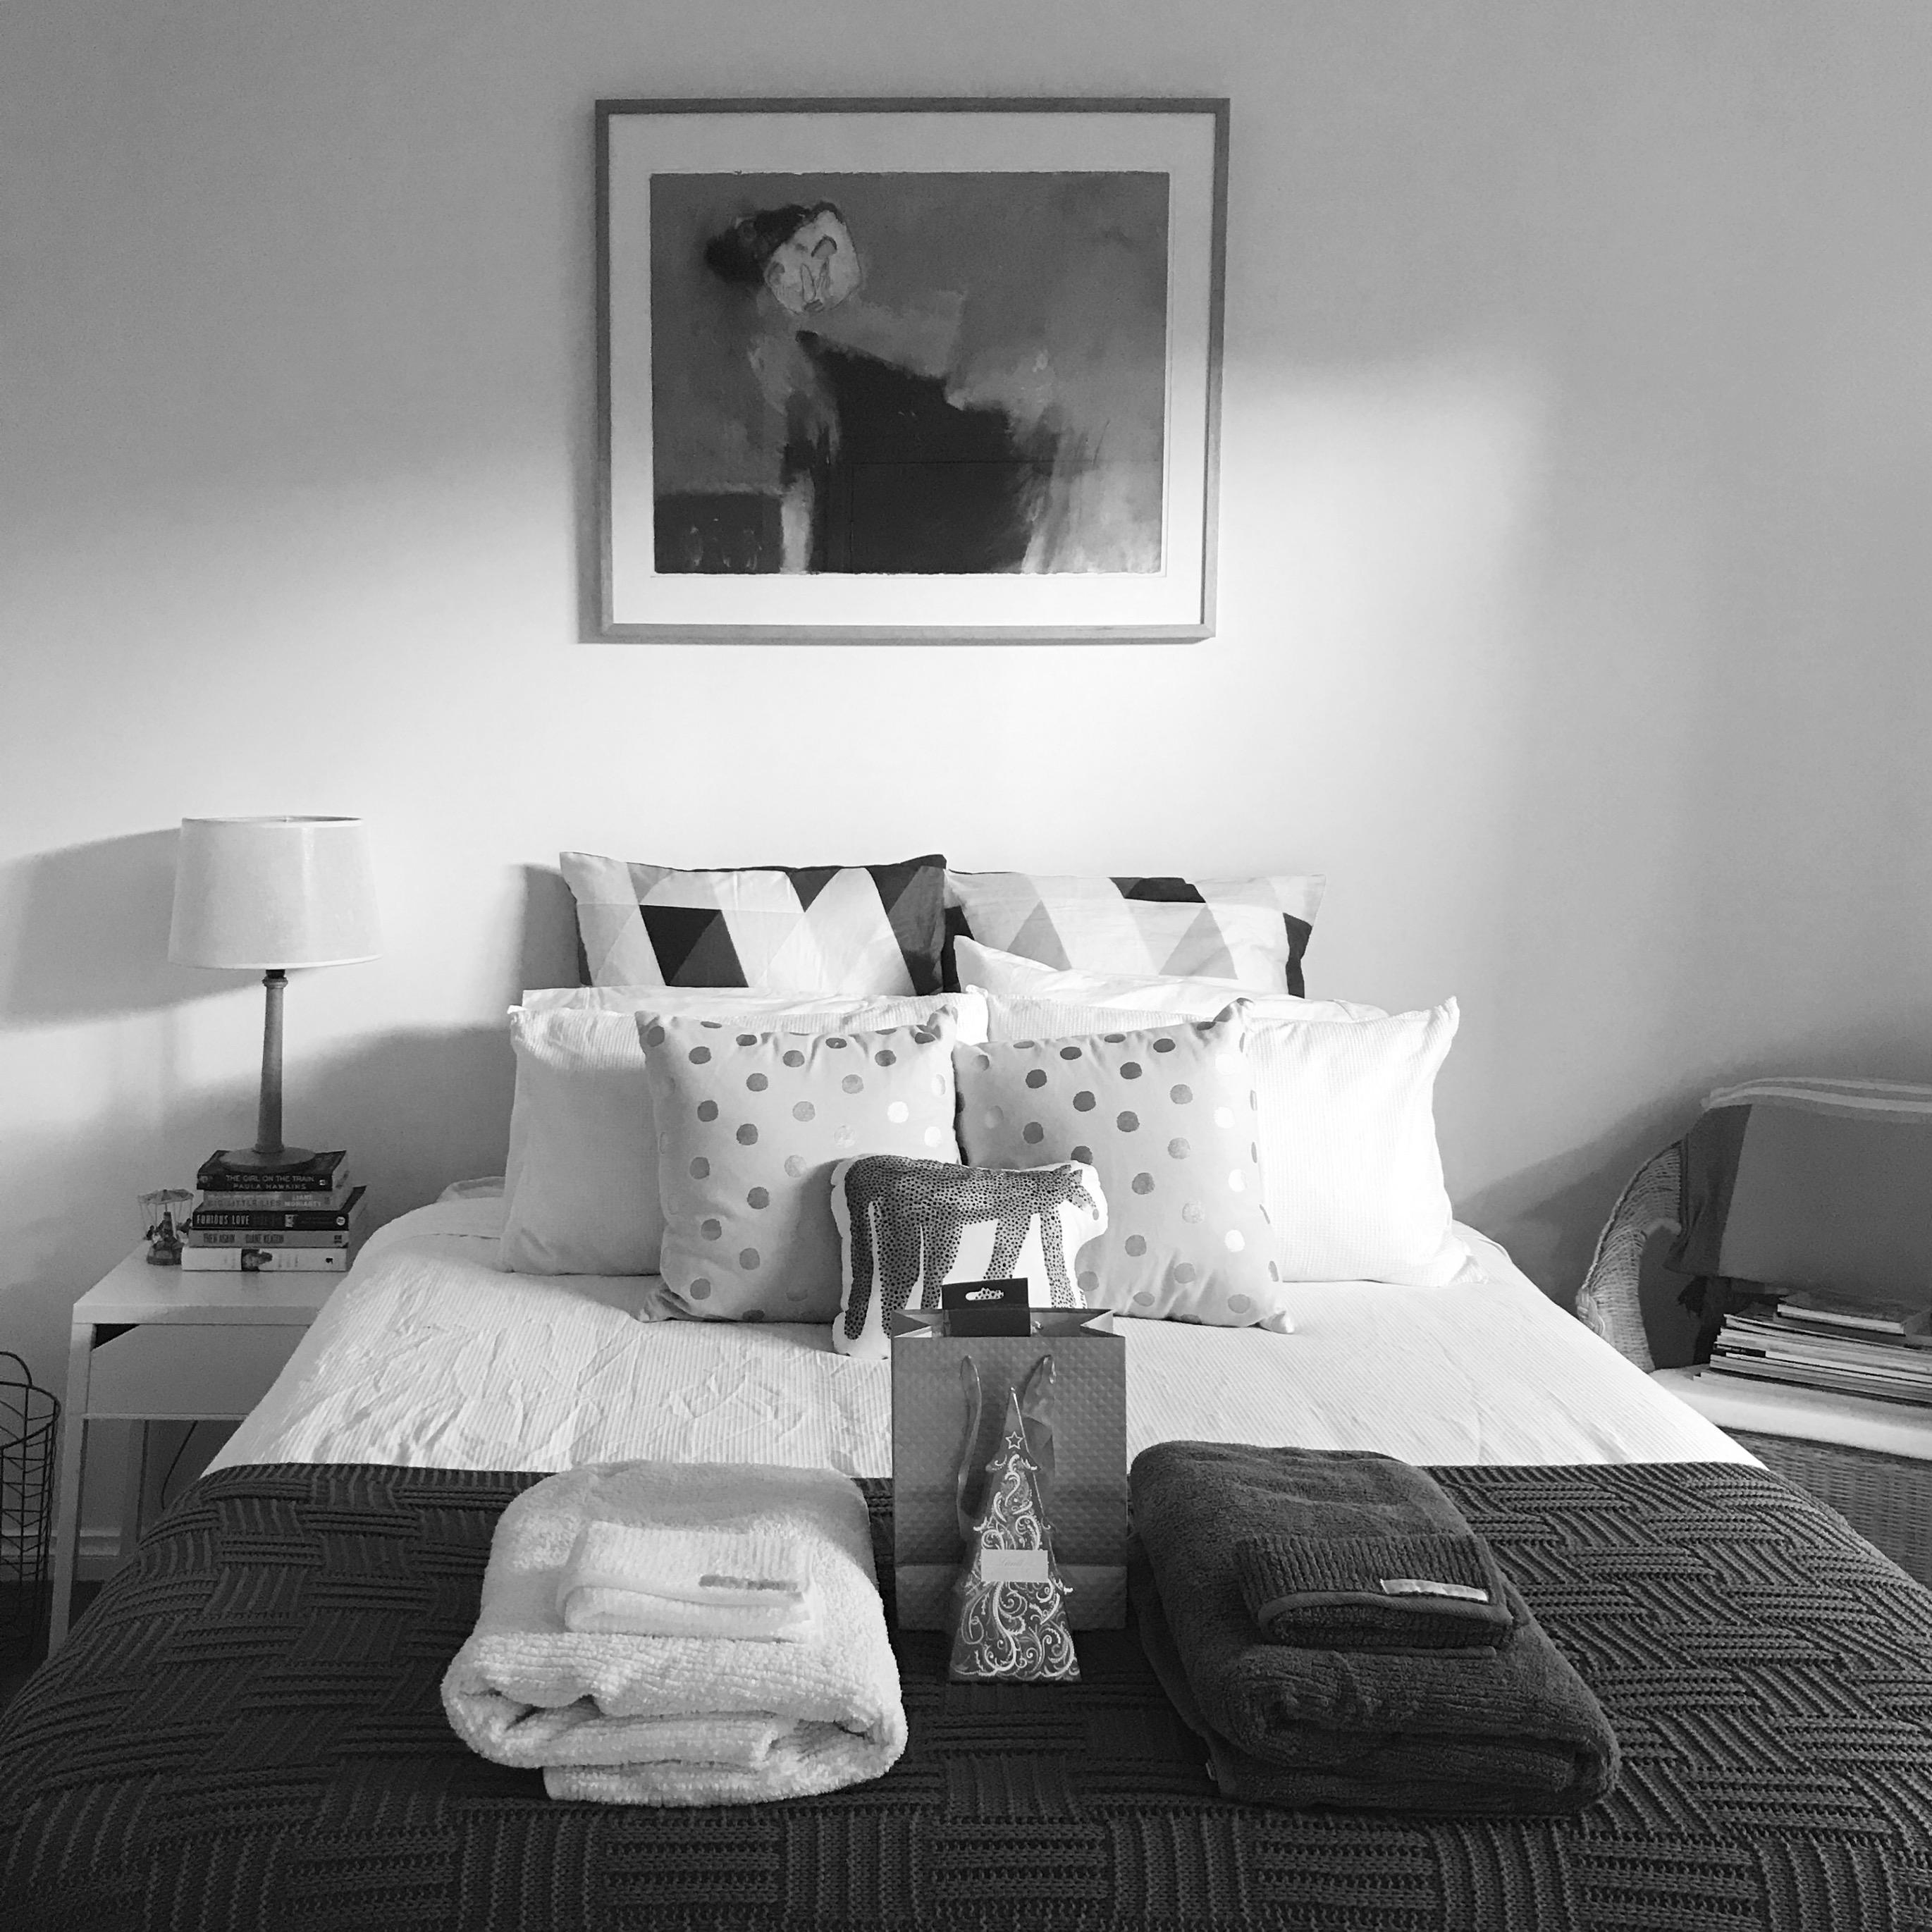 354. 20 DEC 17-Guest room, waiting for guests_insta.JPG